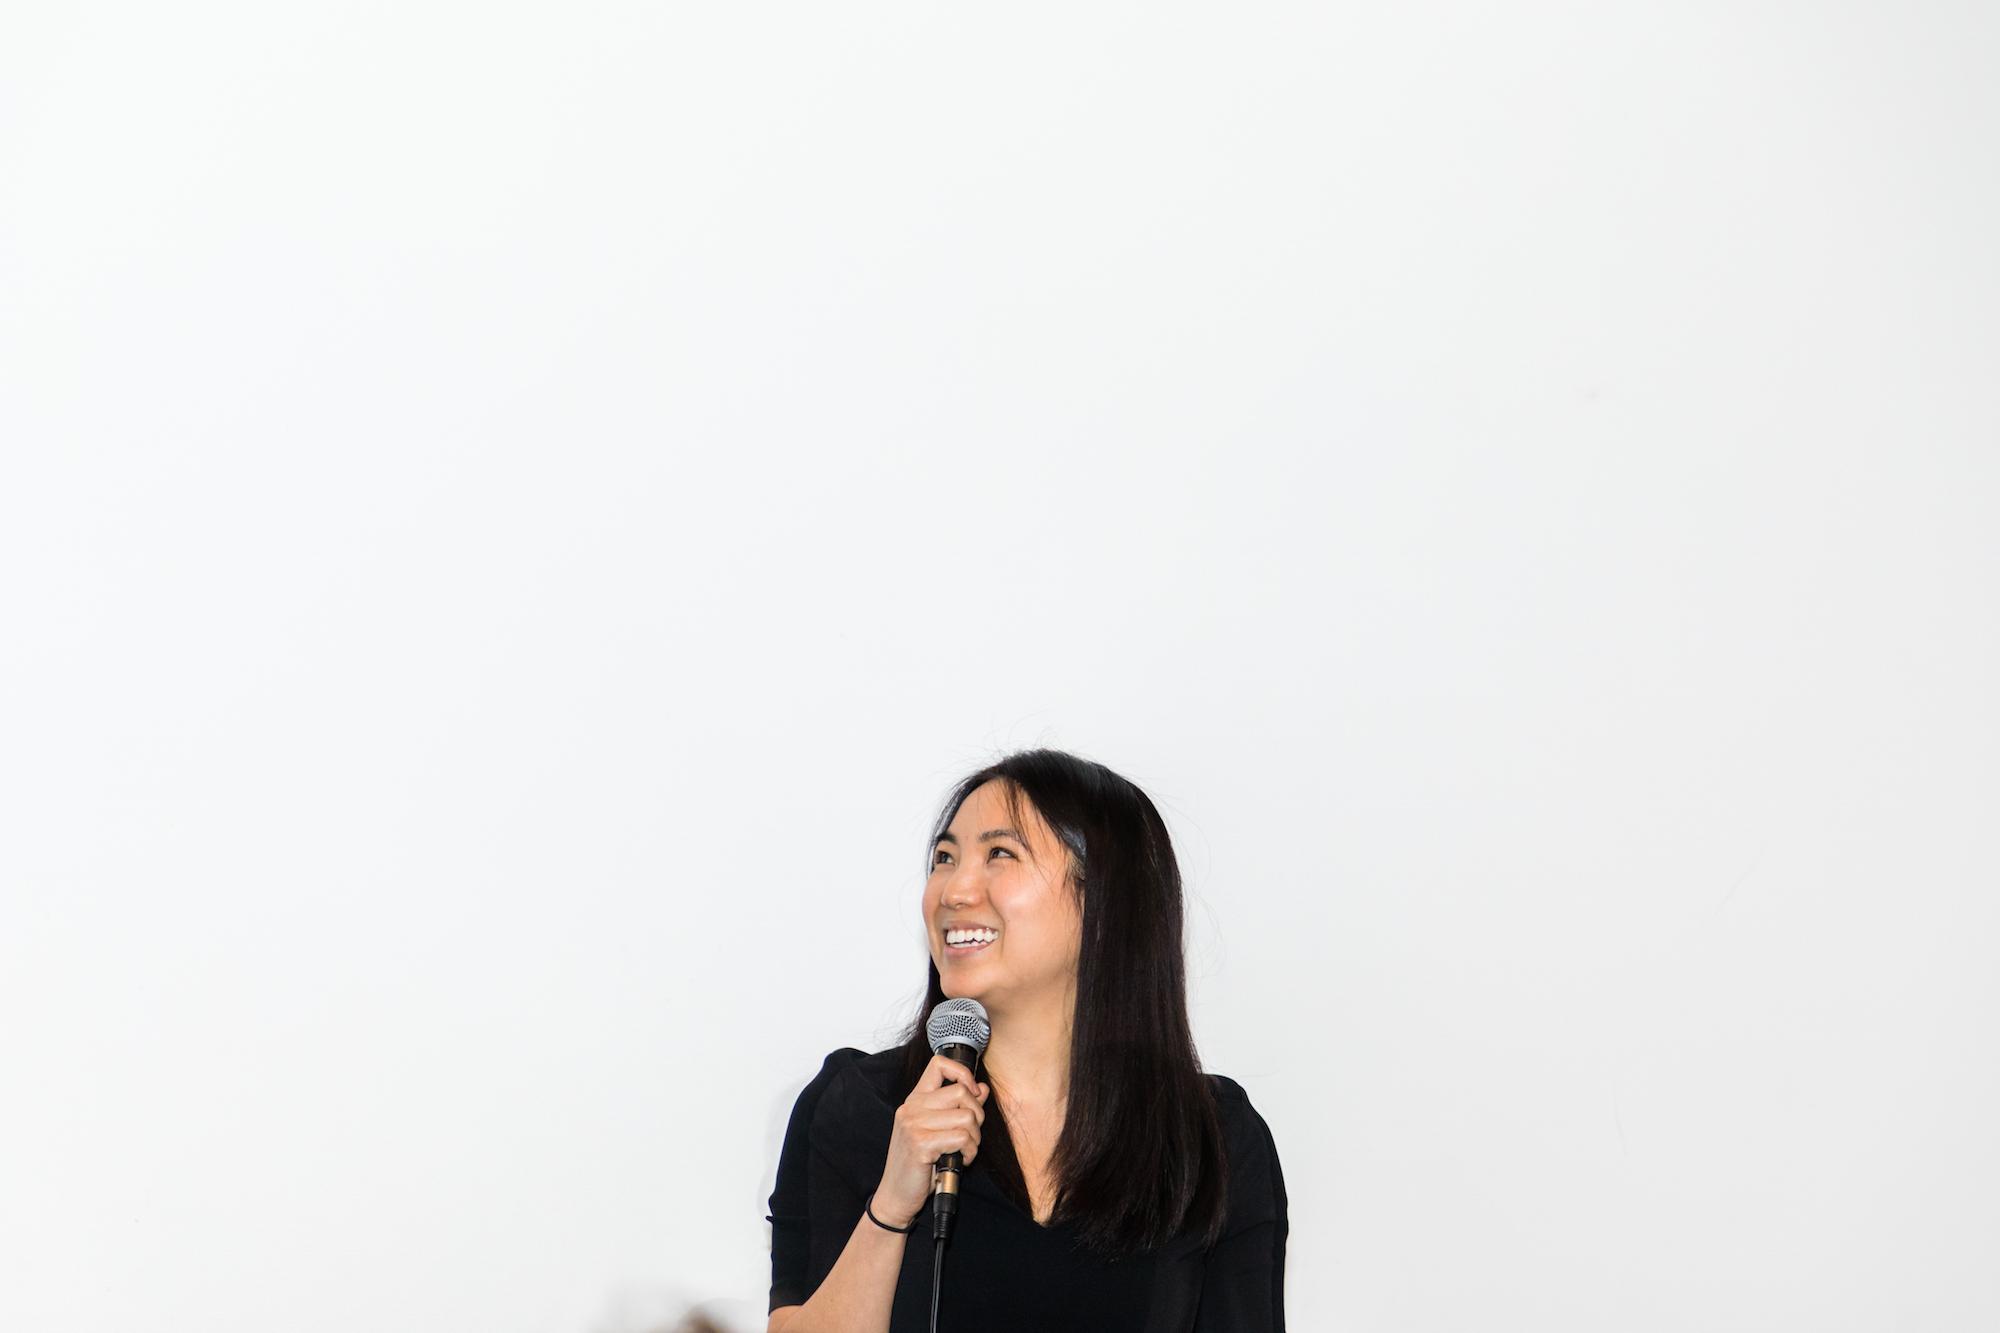 Chloe-Jackman-Photography-Camelback-Ventures-2018-190.jpg